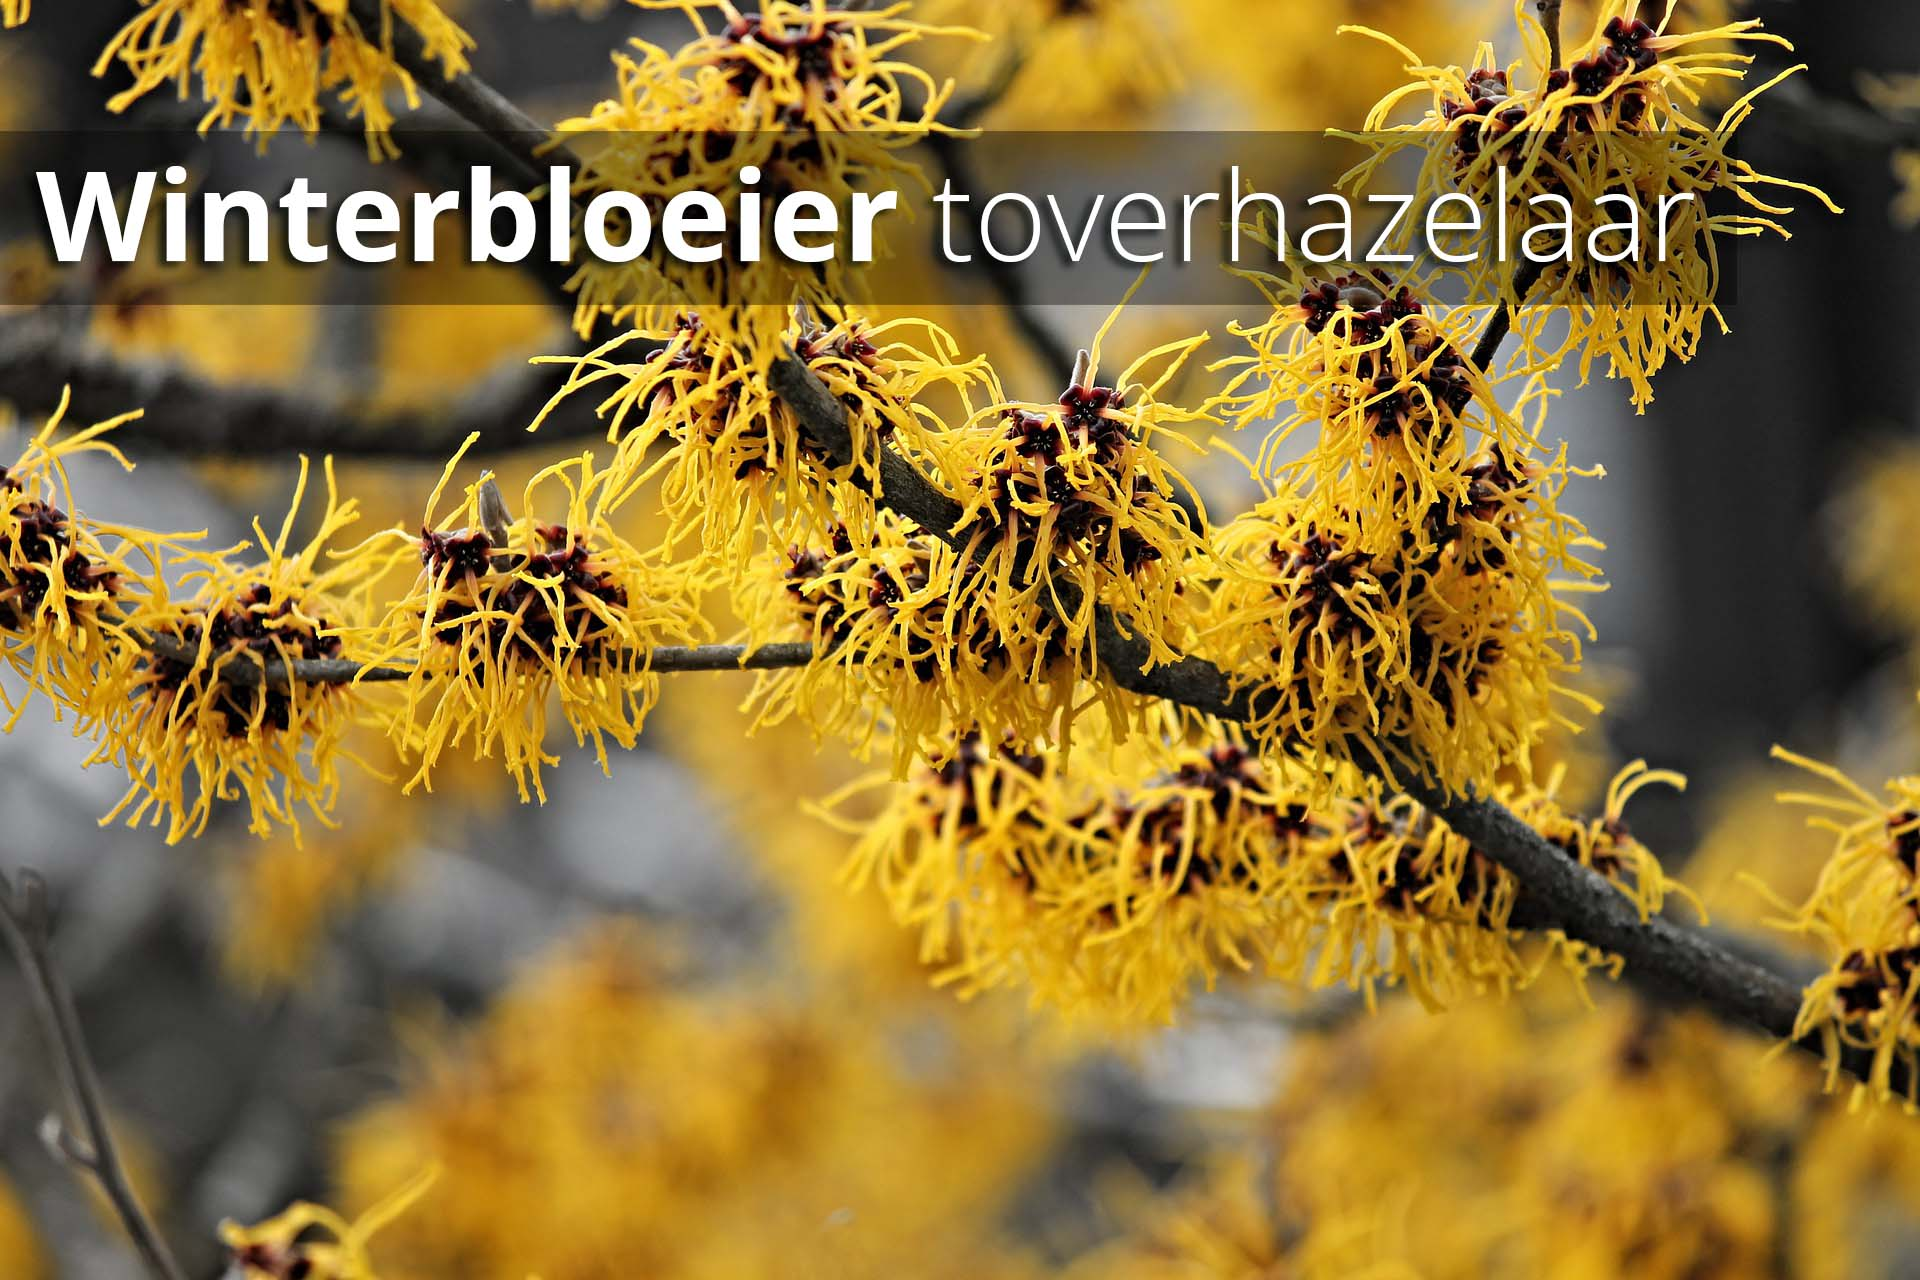 Hoefakker Tuinonderhoud september Plant winterbloeier toverhazelaar